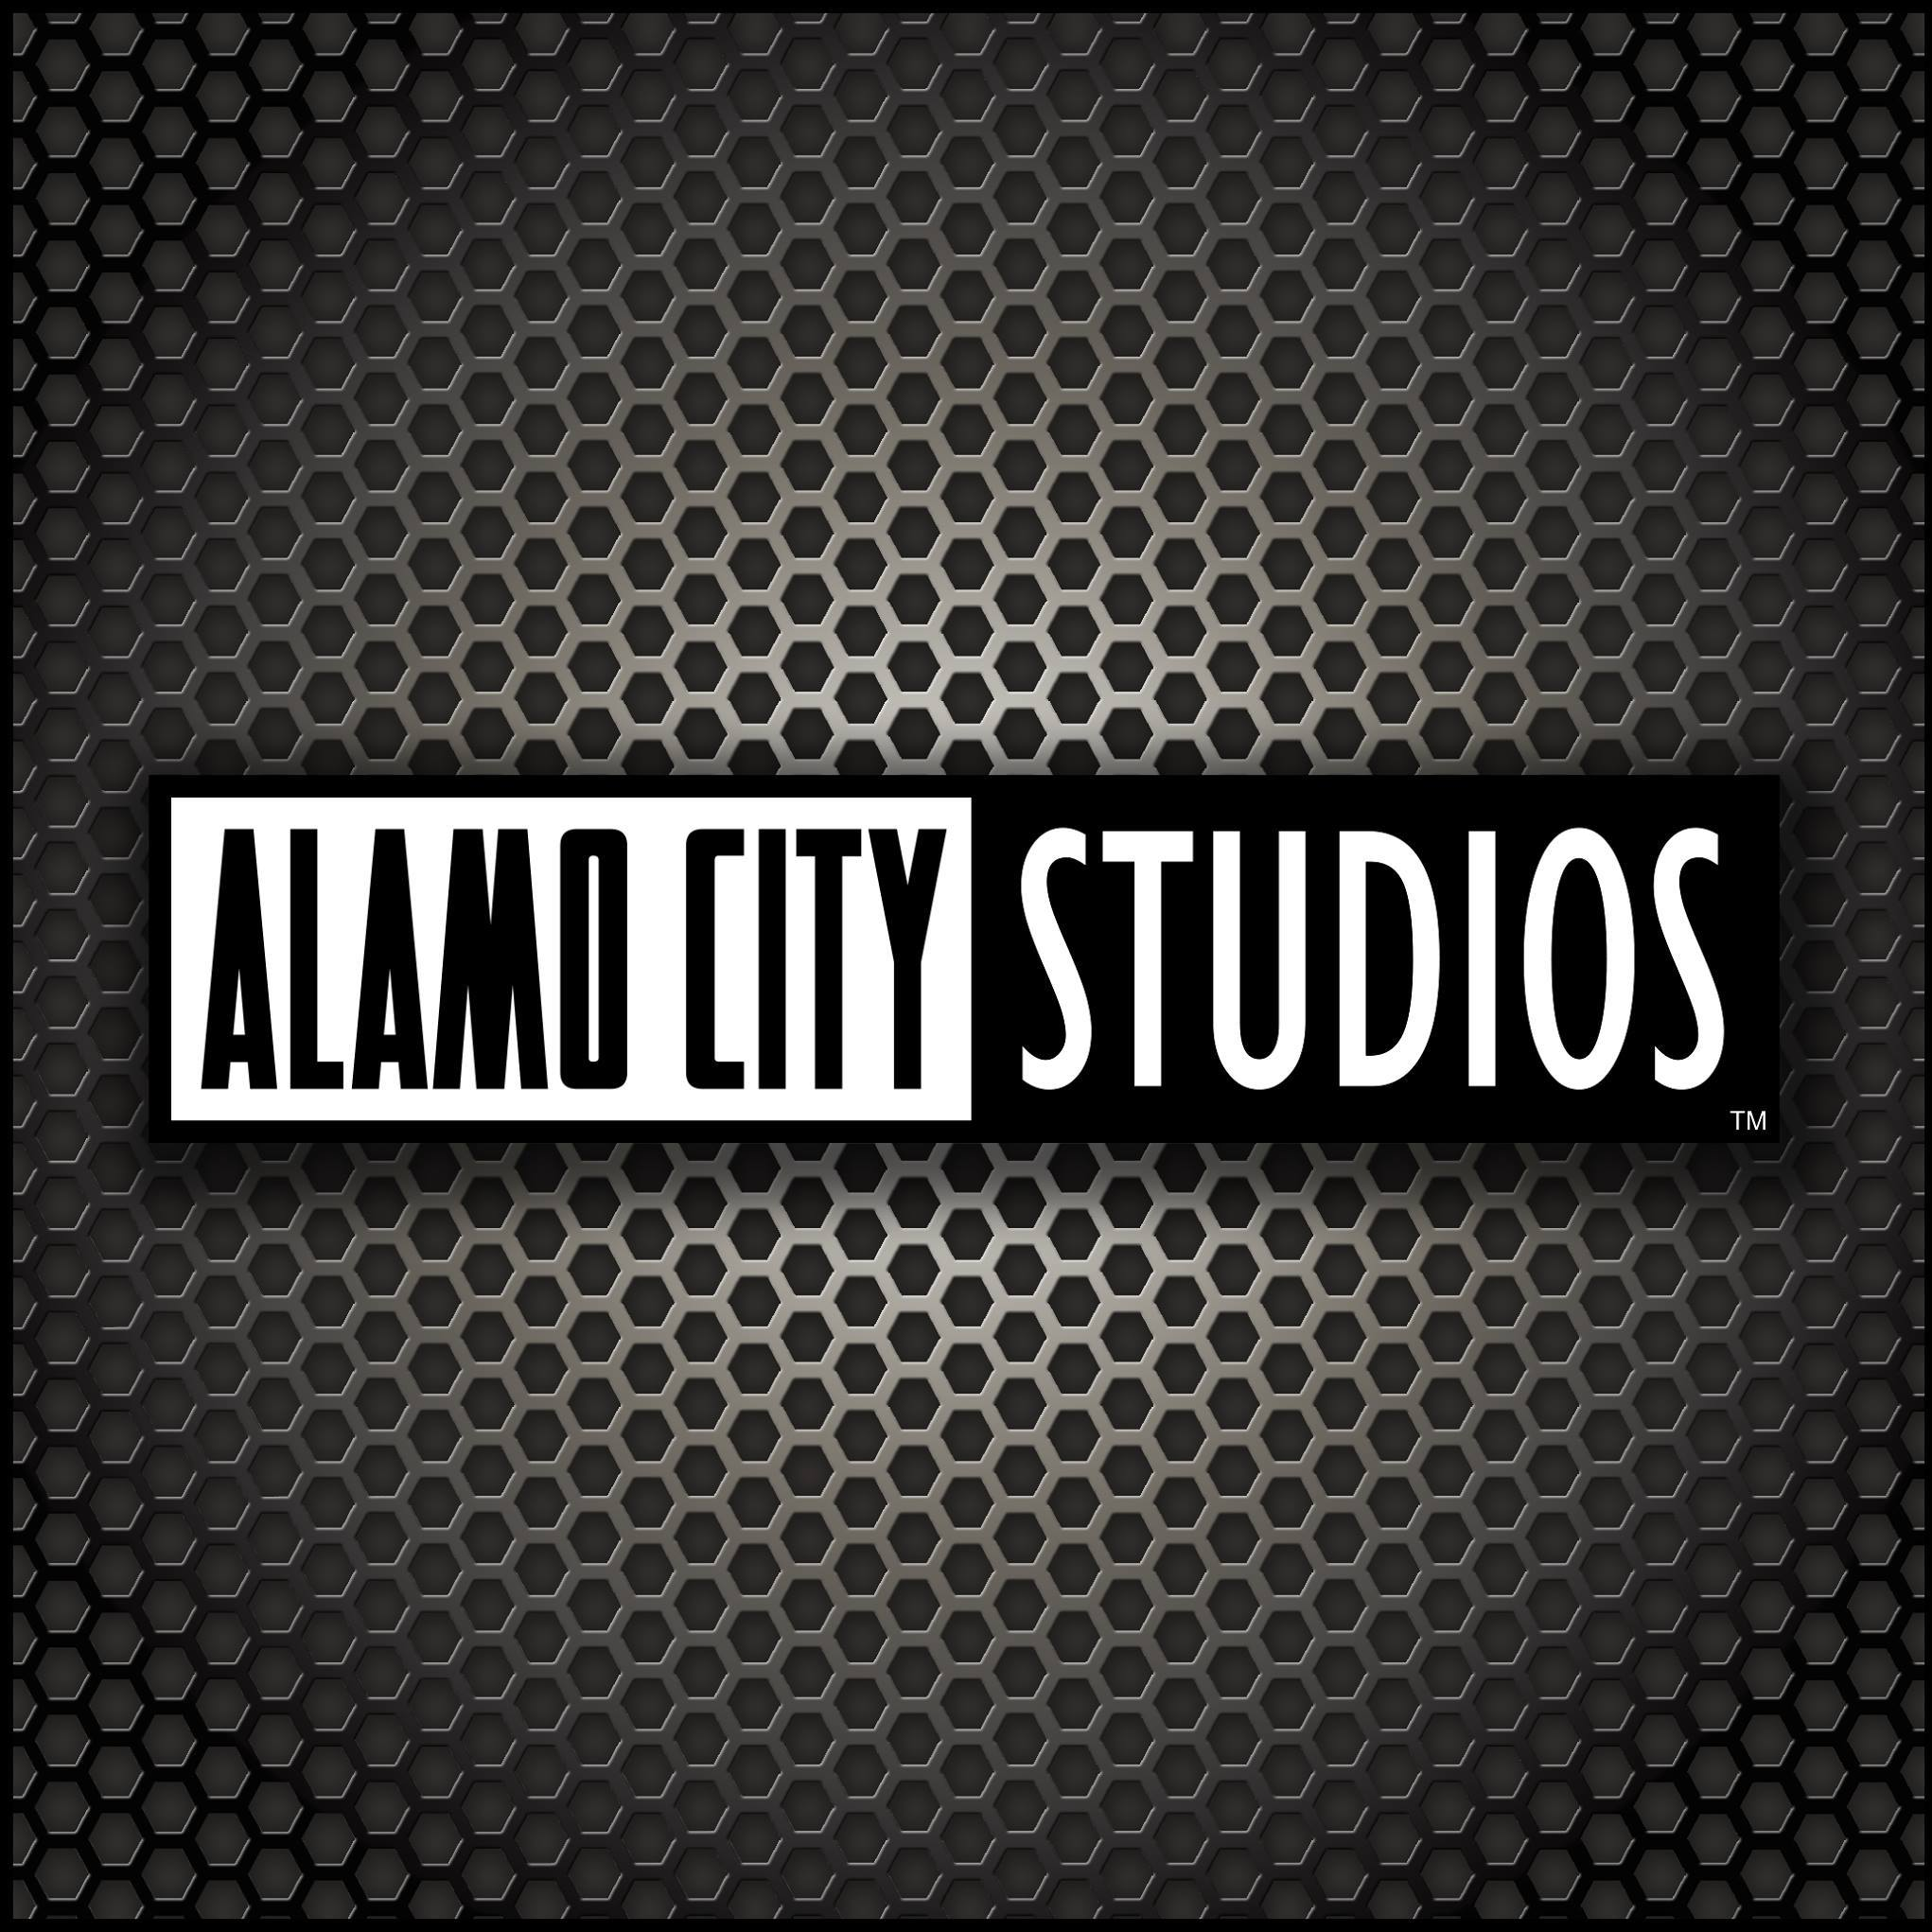 Alamo_City_Studios